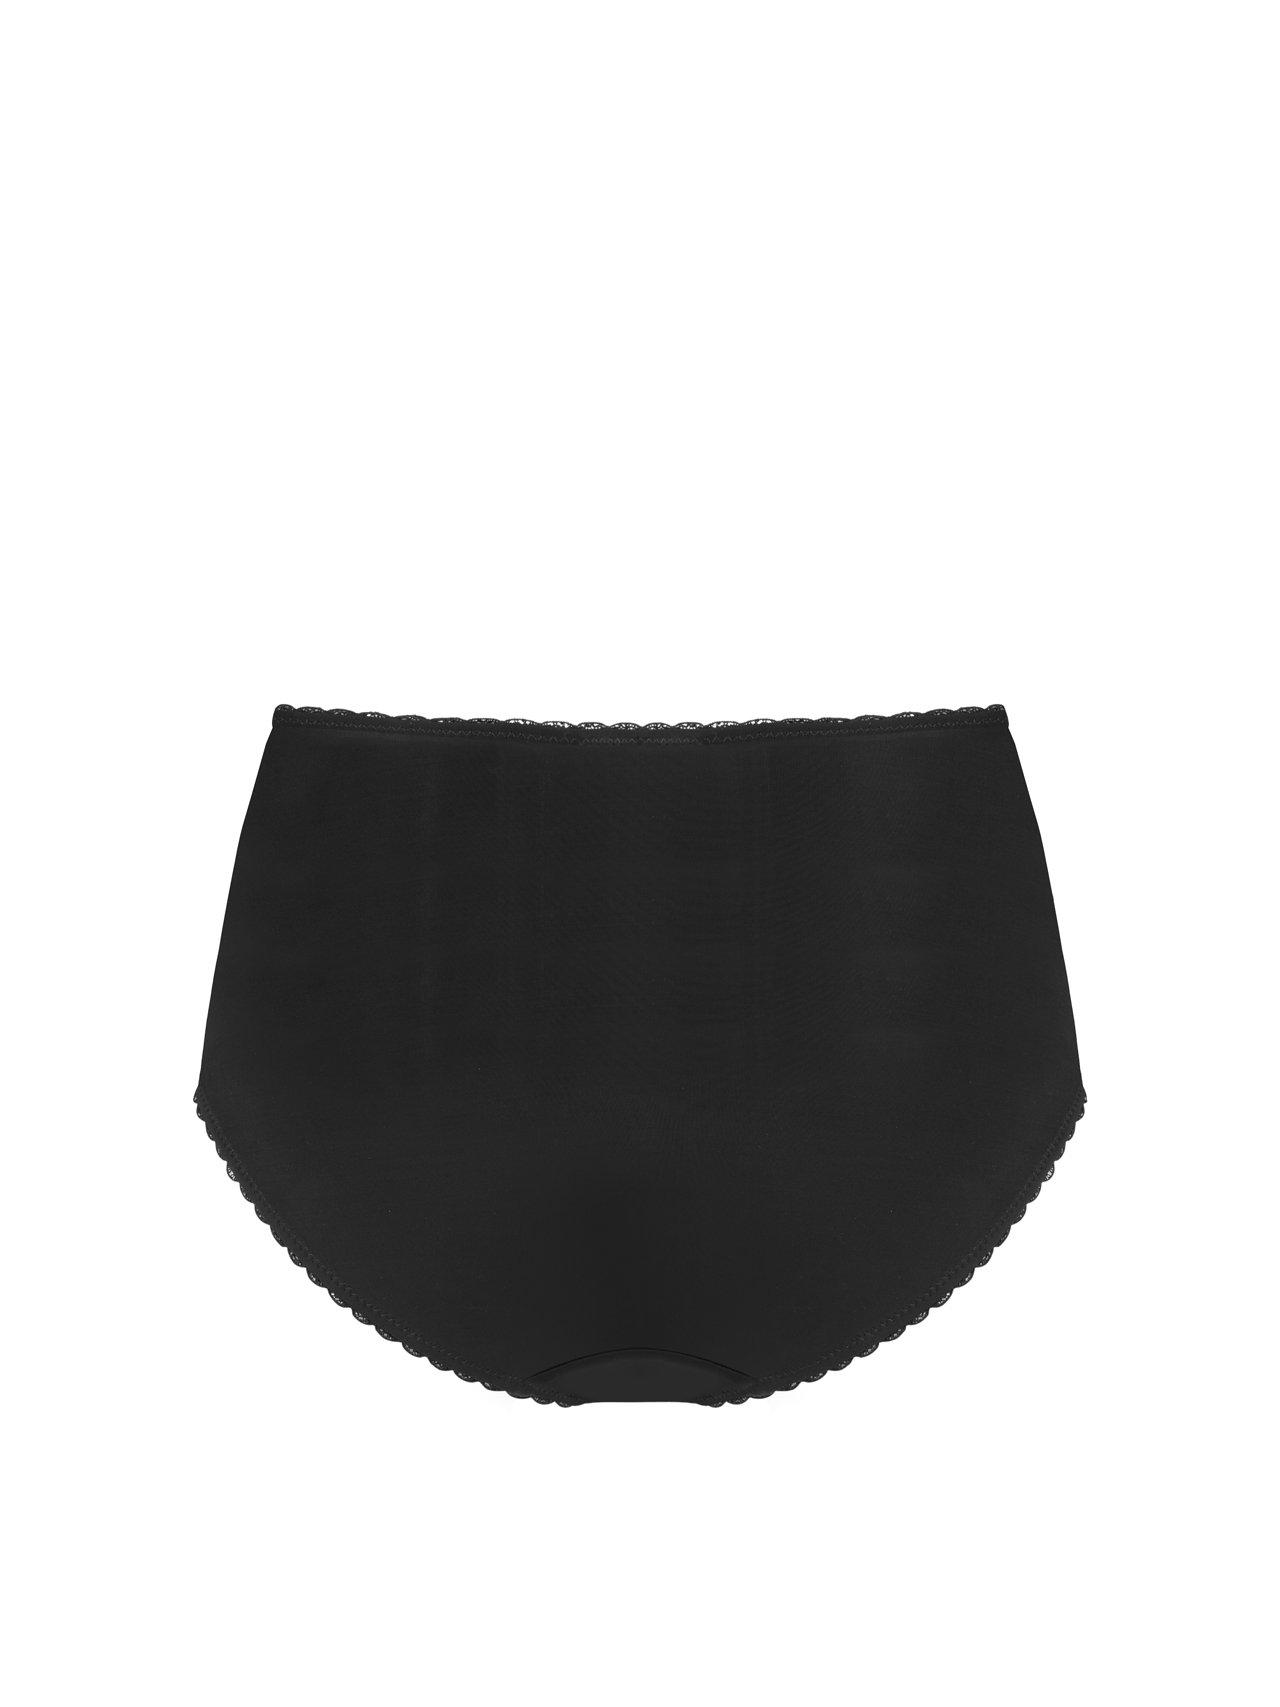 Quần lưng cao - High waist brief - 0301A